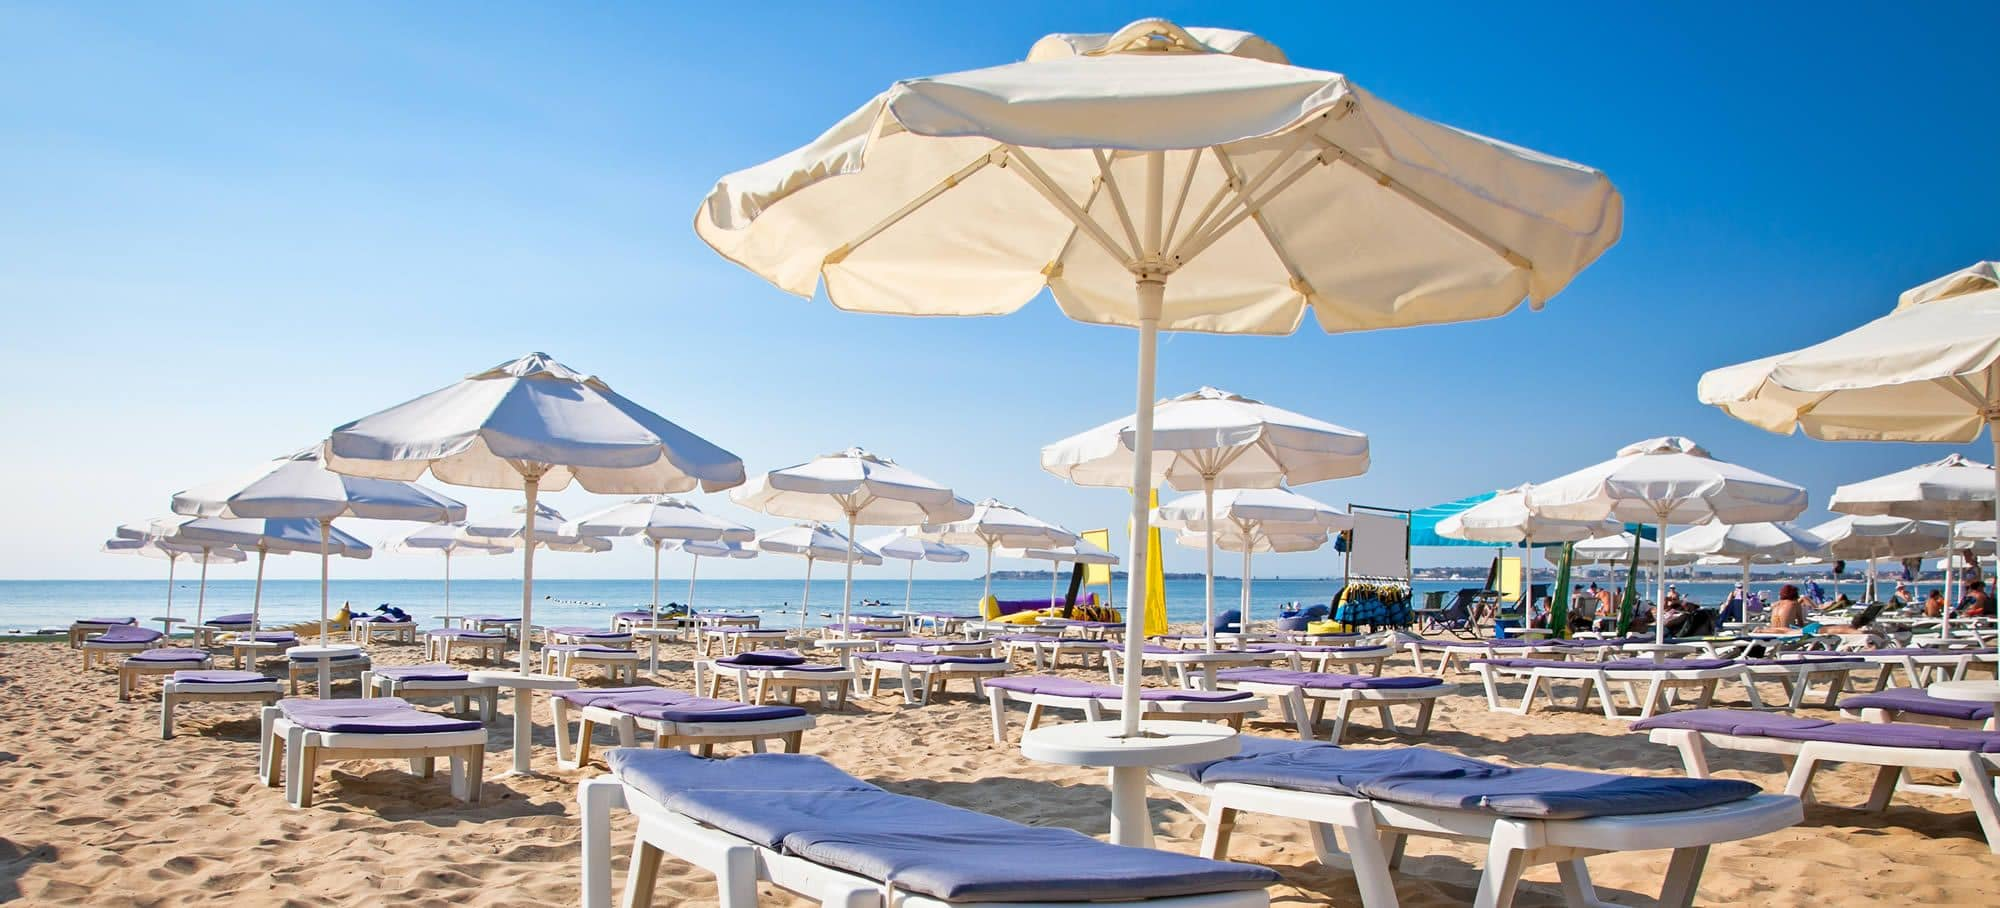 Hotel per Famiglie Riviera Romagnola